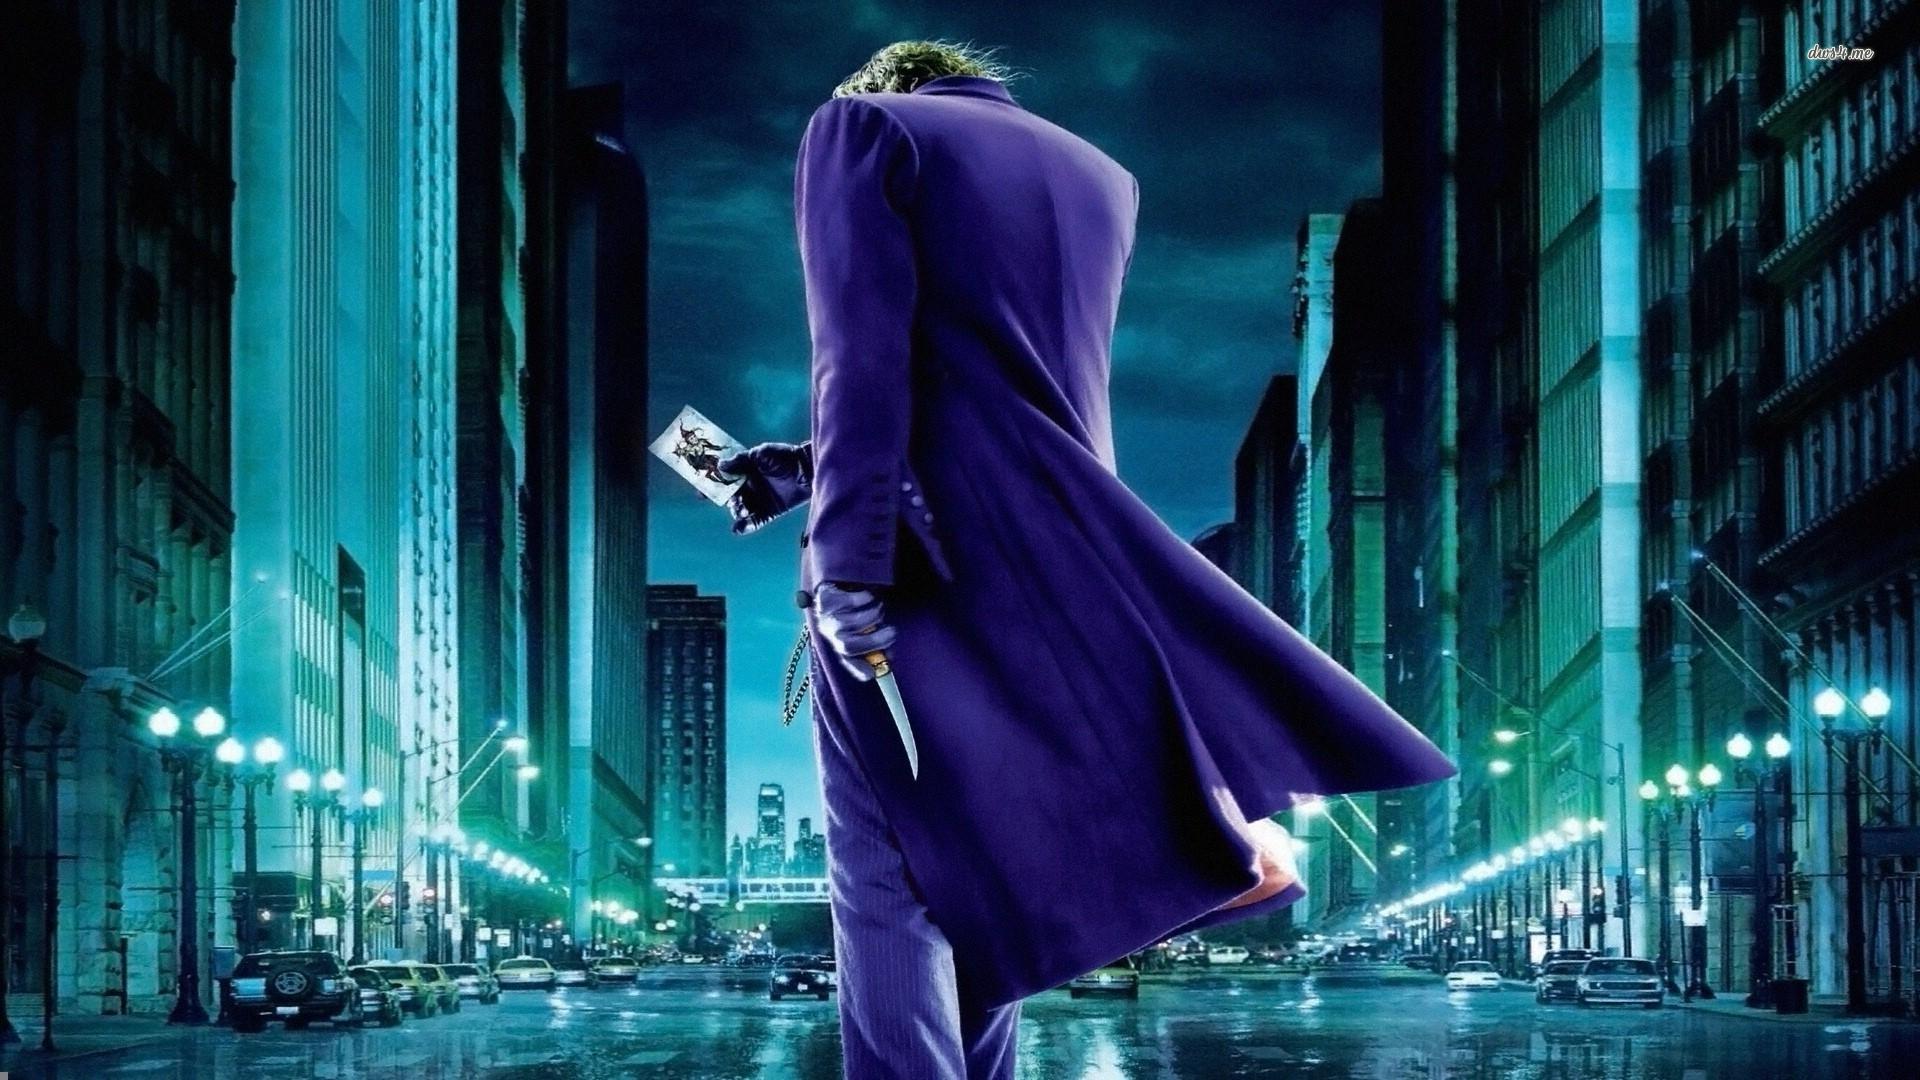 Joker The Dark Knight Wallpaper Desktop 3441 Hd Wallpapers 1920x1080